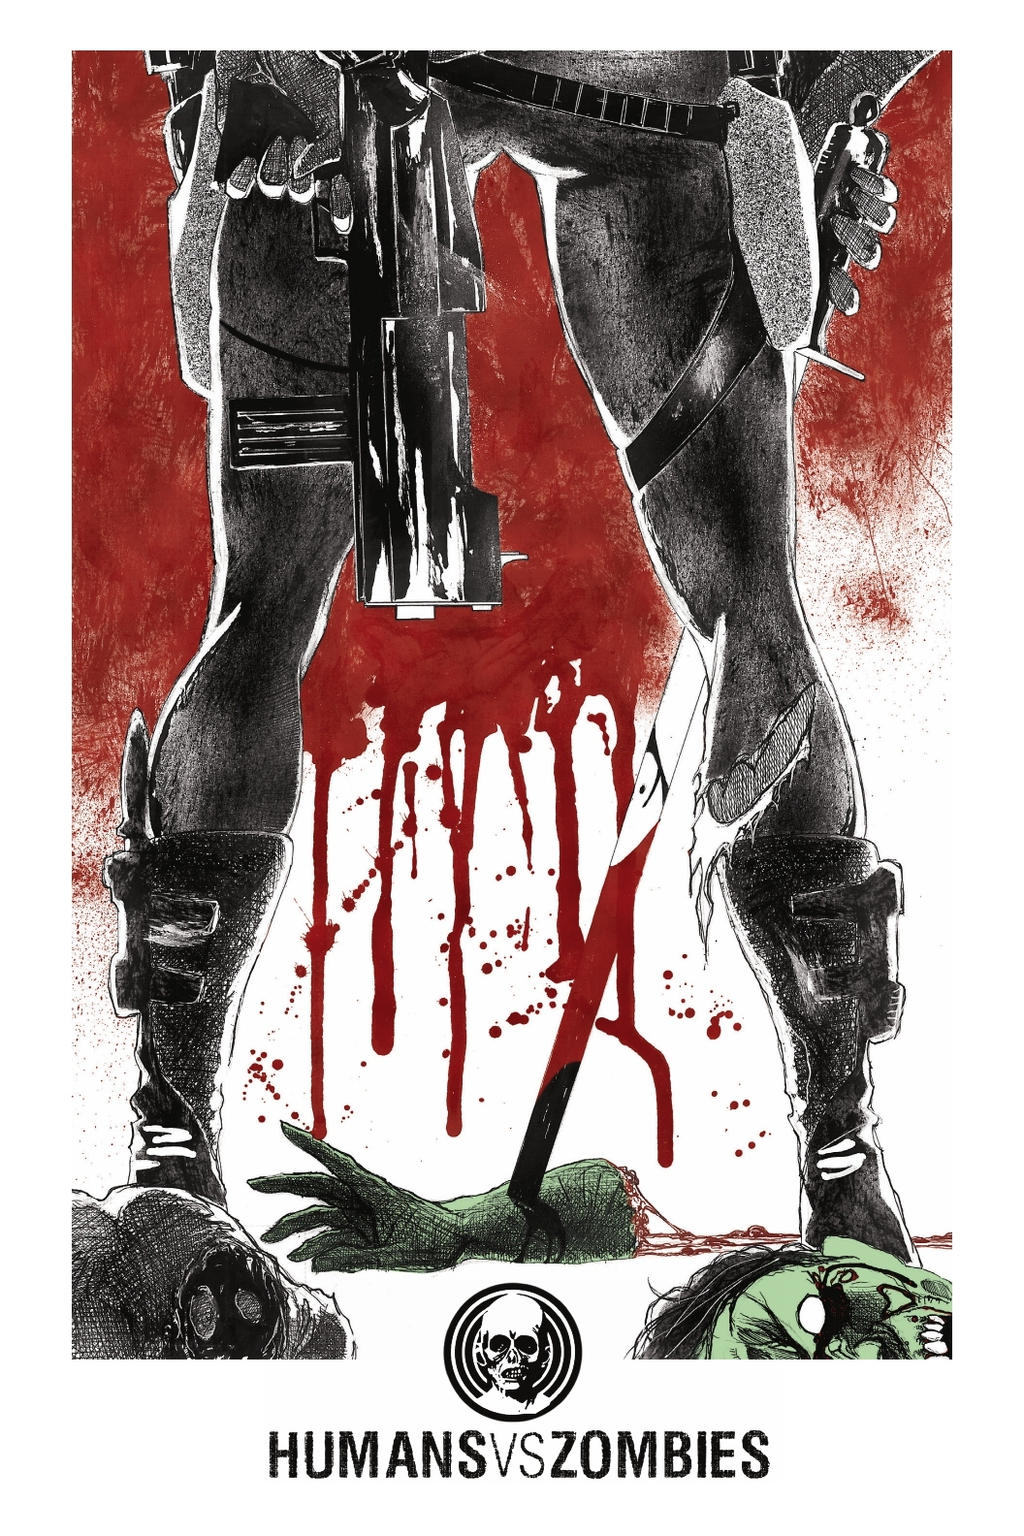 Final HVZ cover art by LoneFoxAndCub